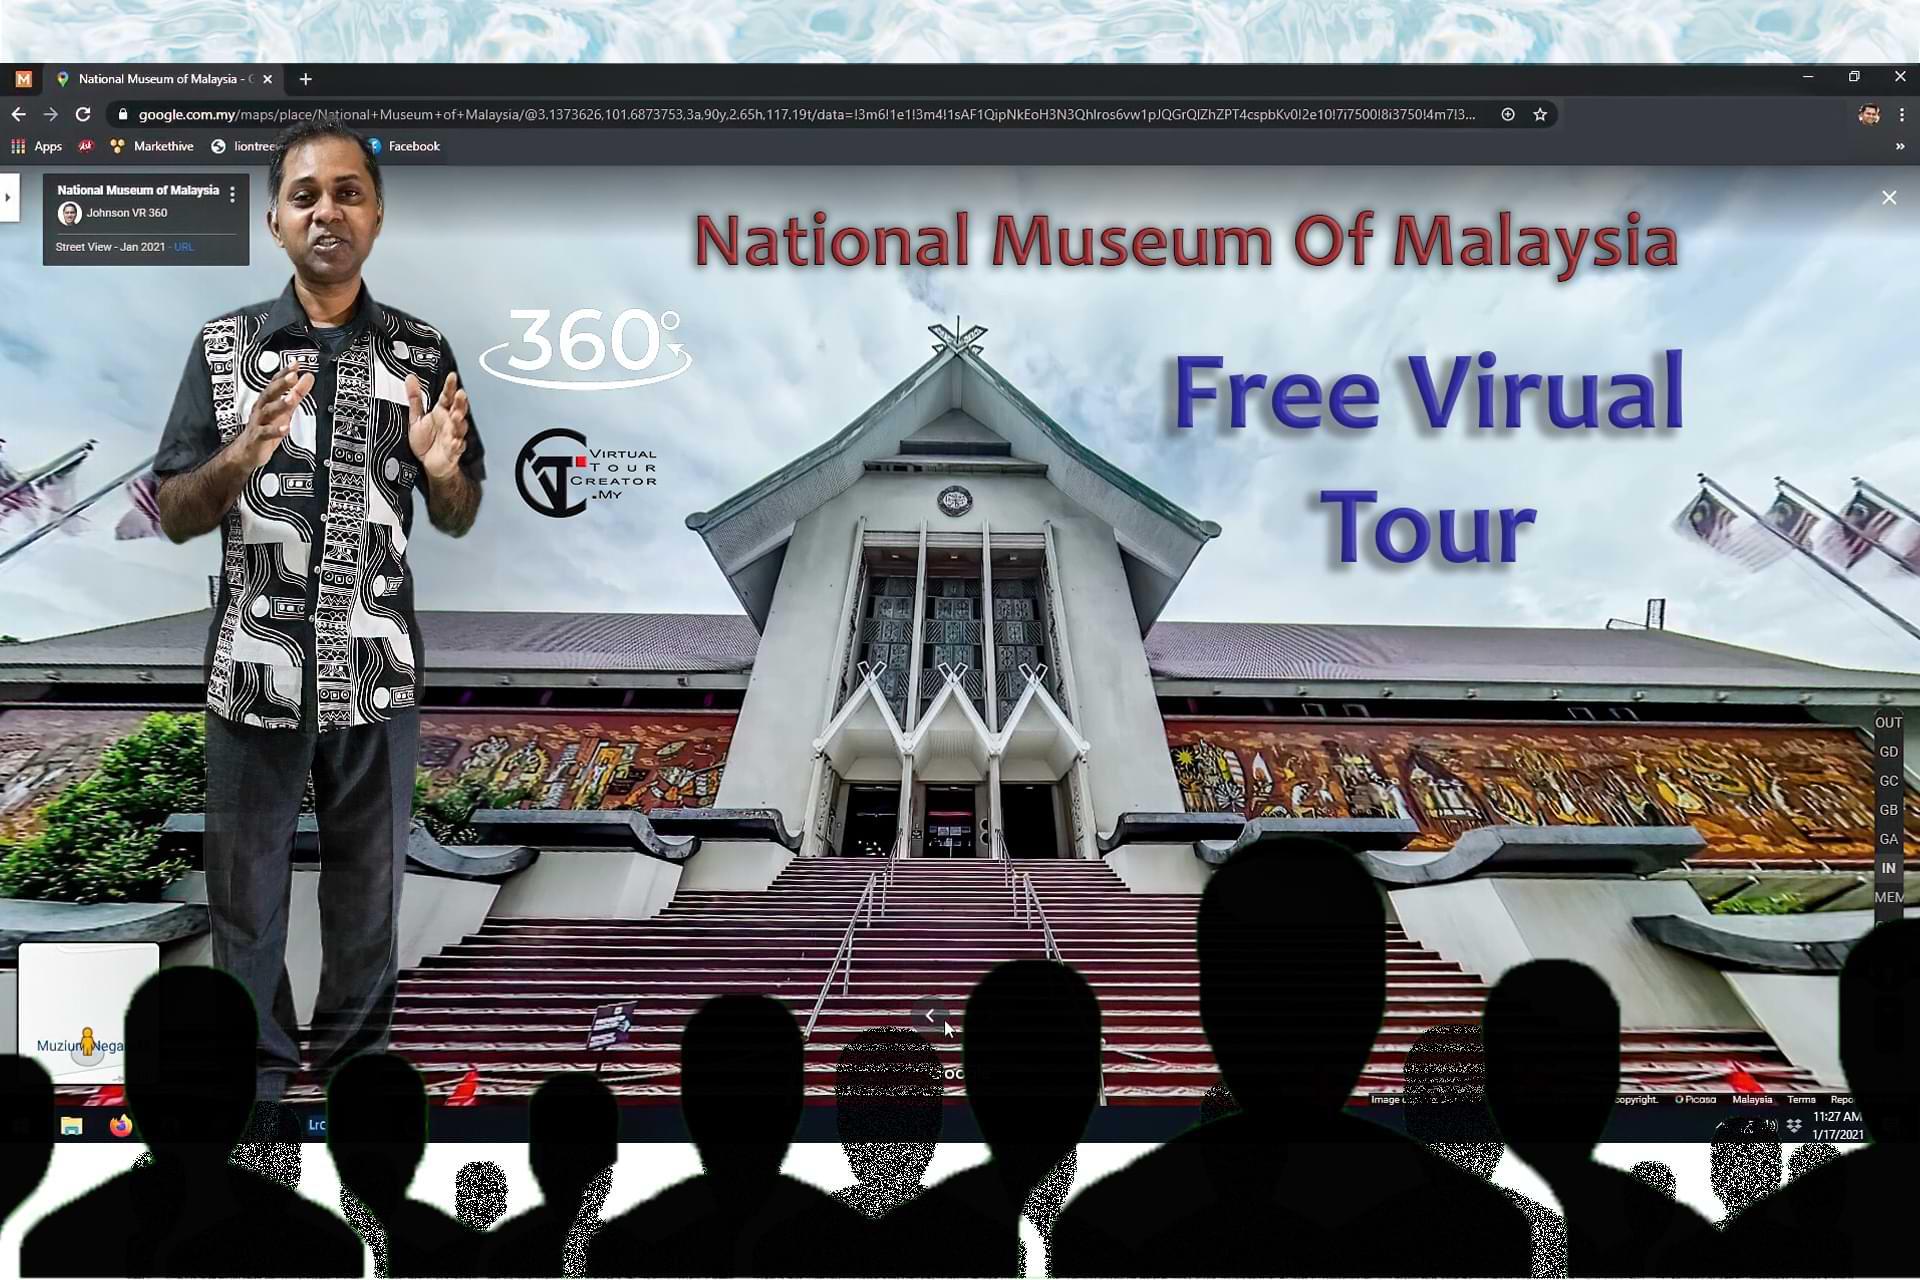 National Museum of Malaysia FREE Virtual Tour